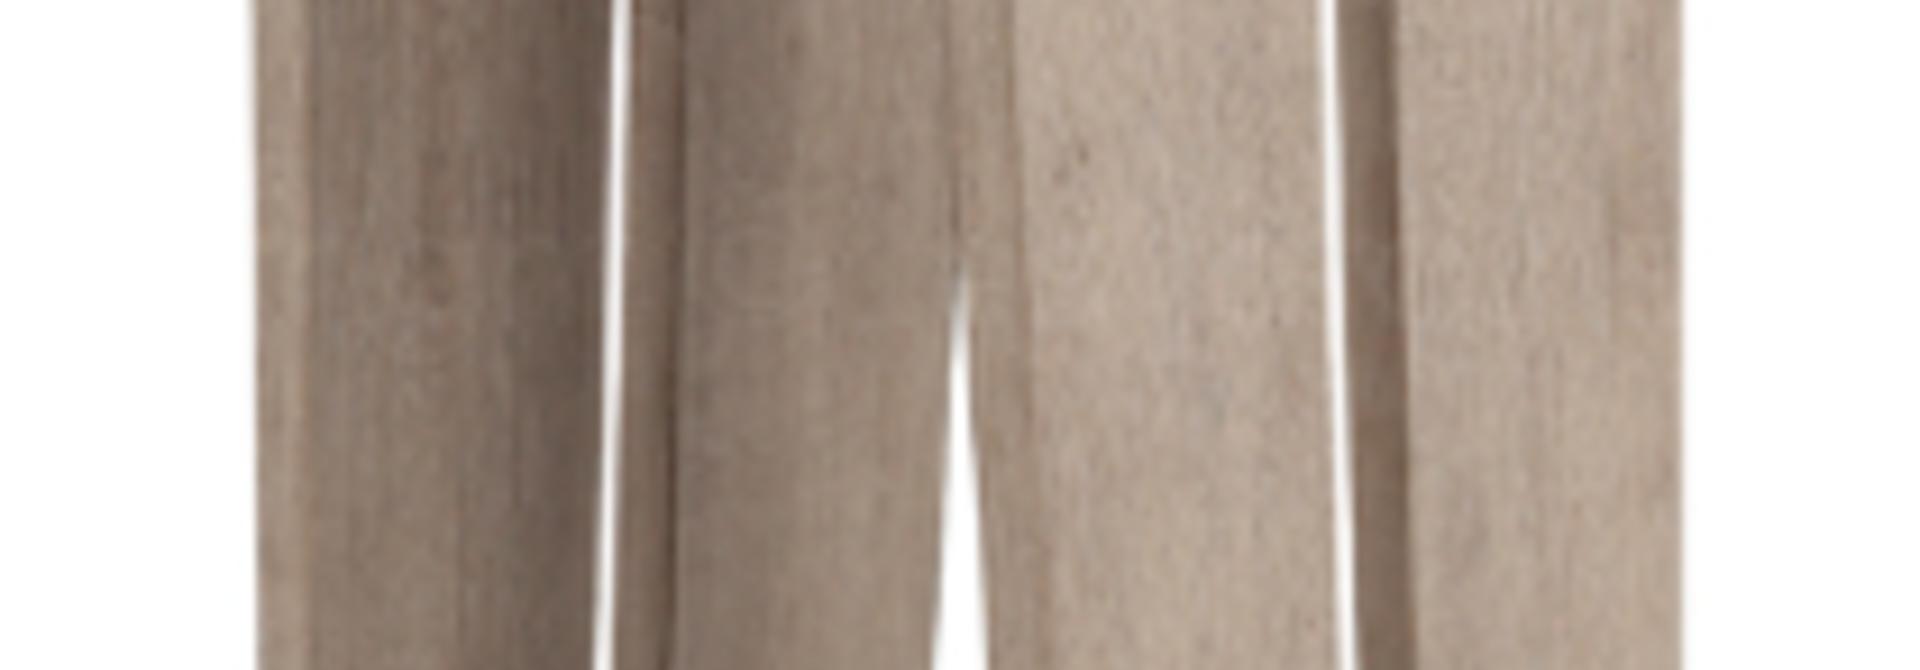 LES JARDINS - Skall Solar Lantern Teak 23x23x65cm